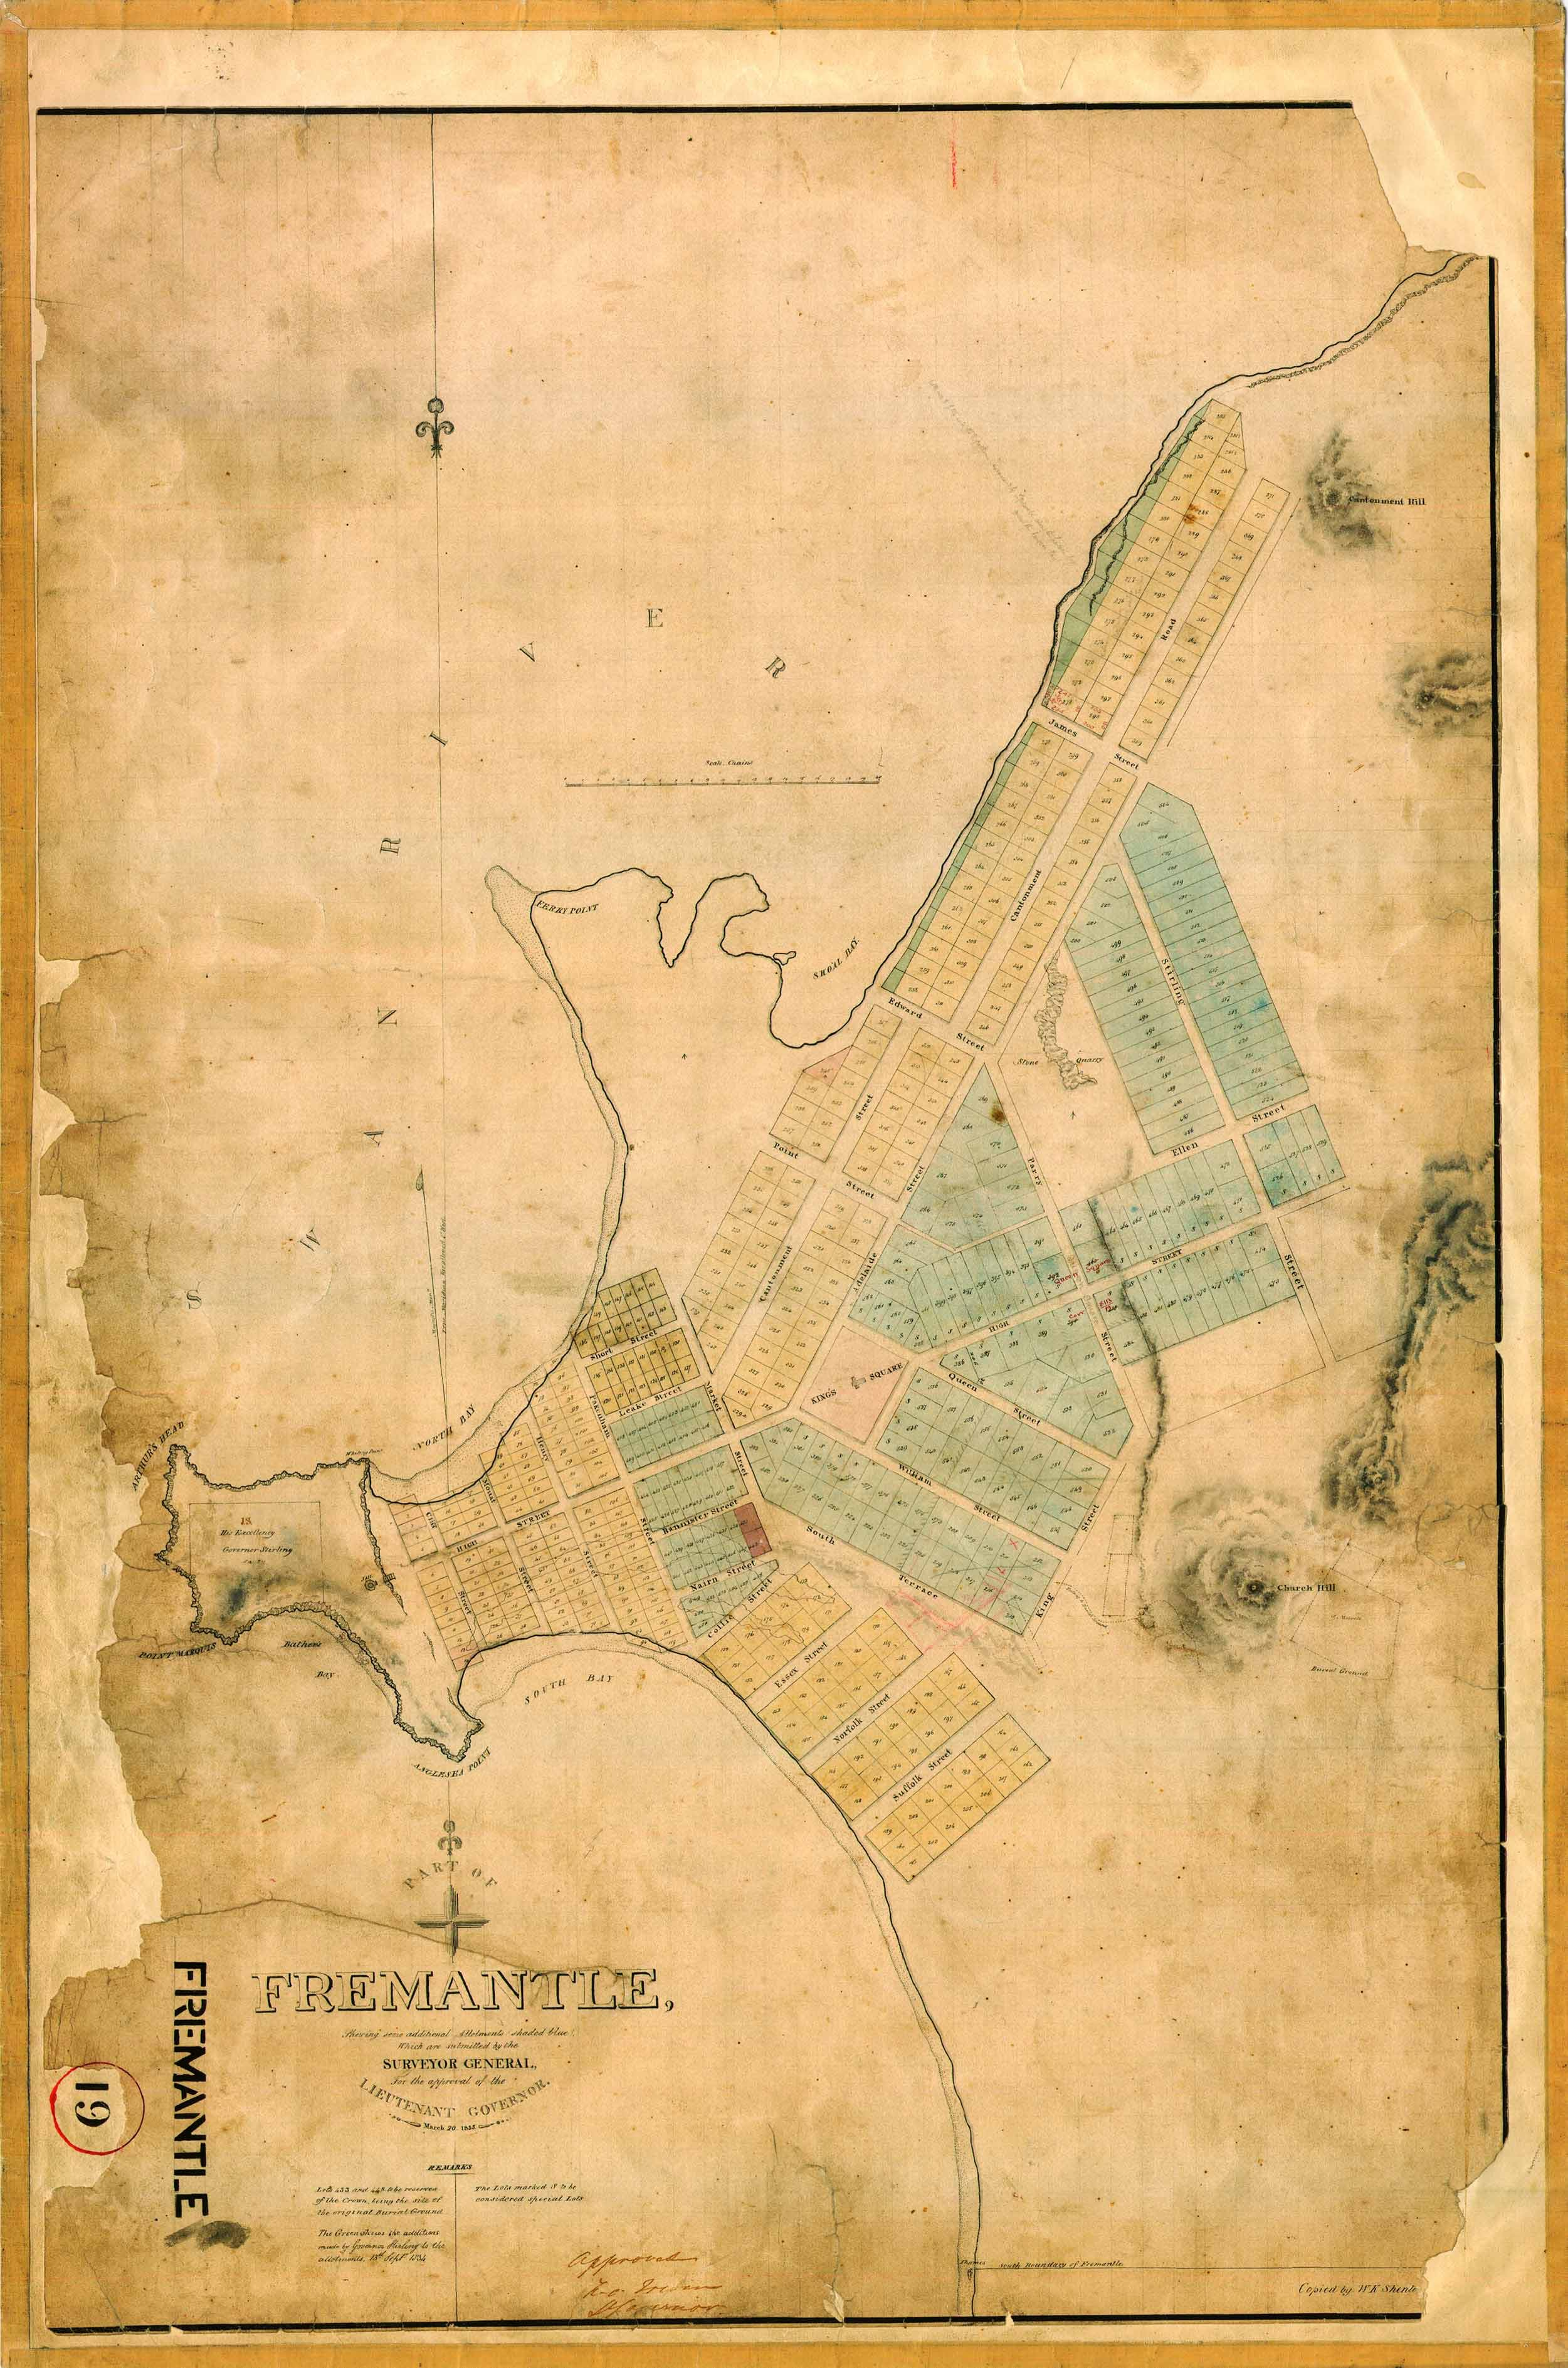 1833 Town Plan